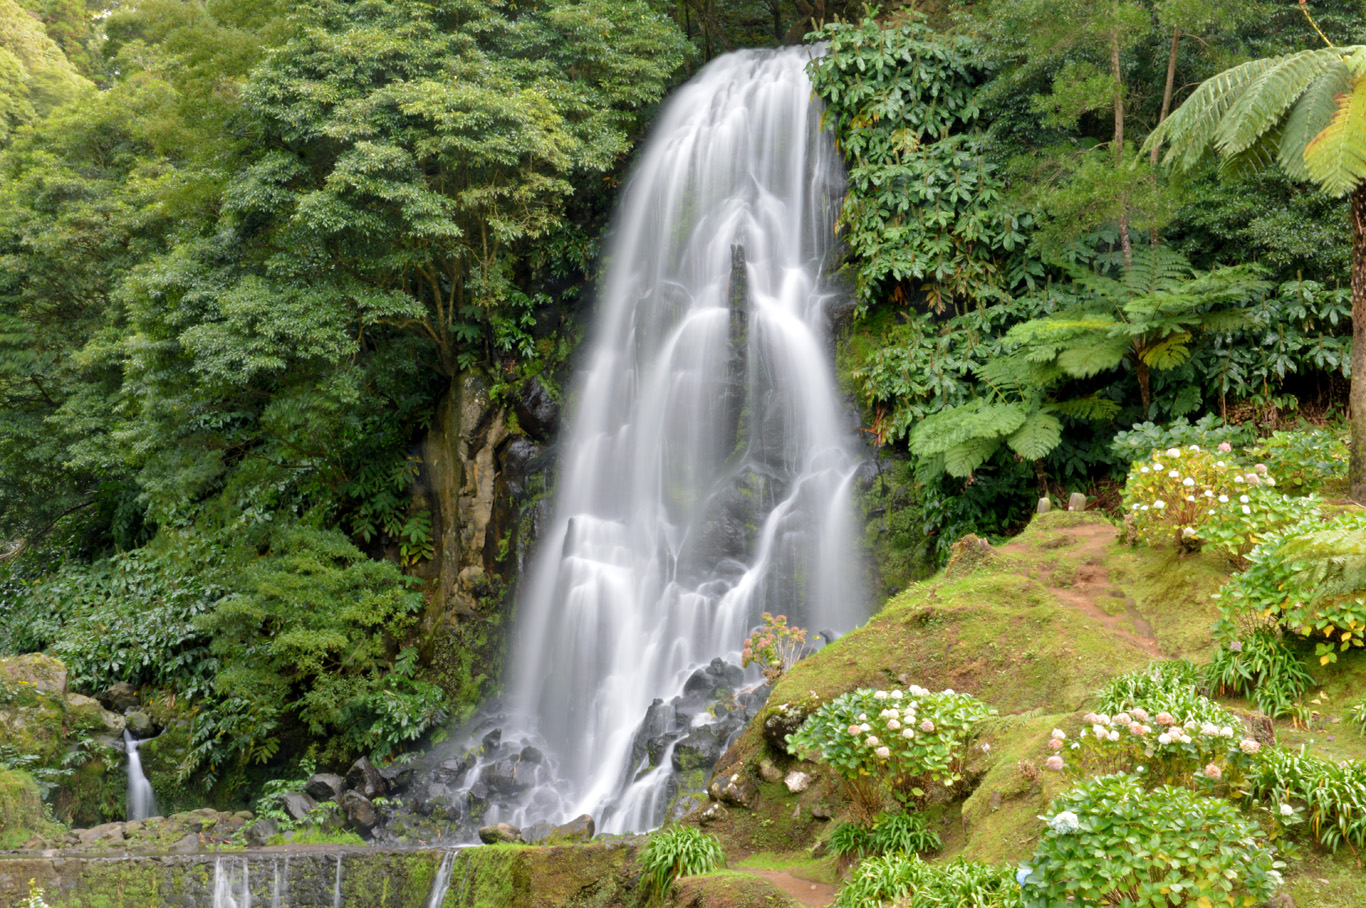 The waterfall in Achada